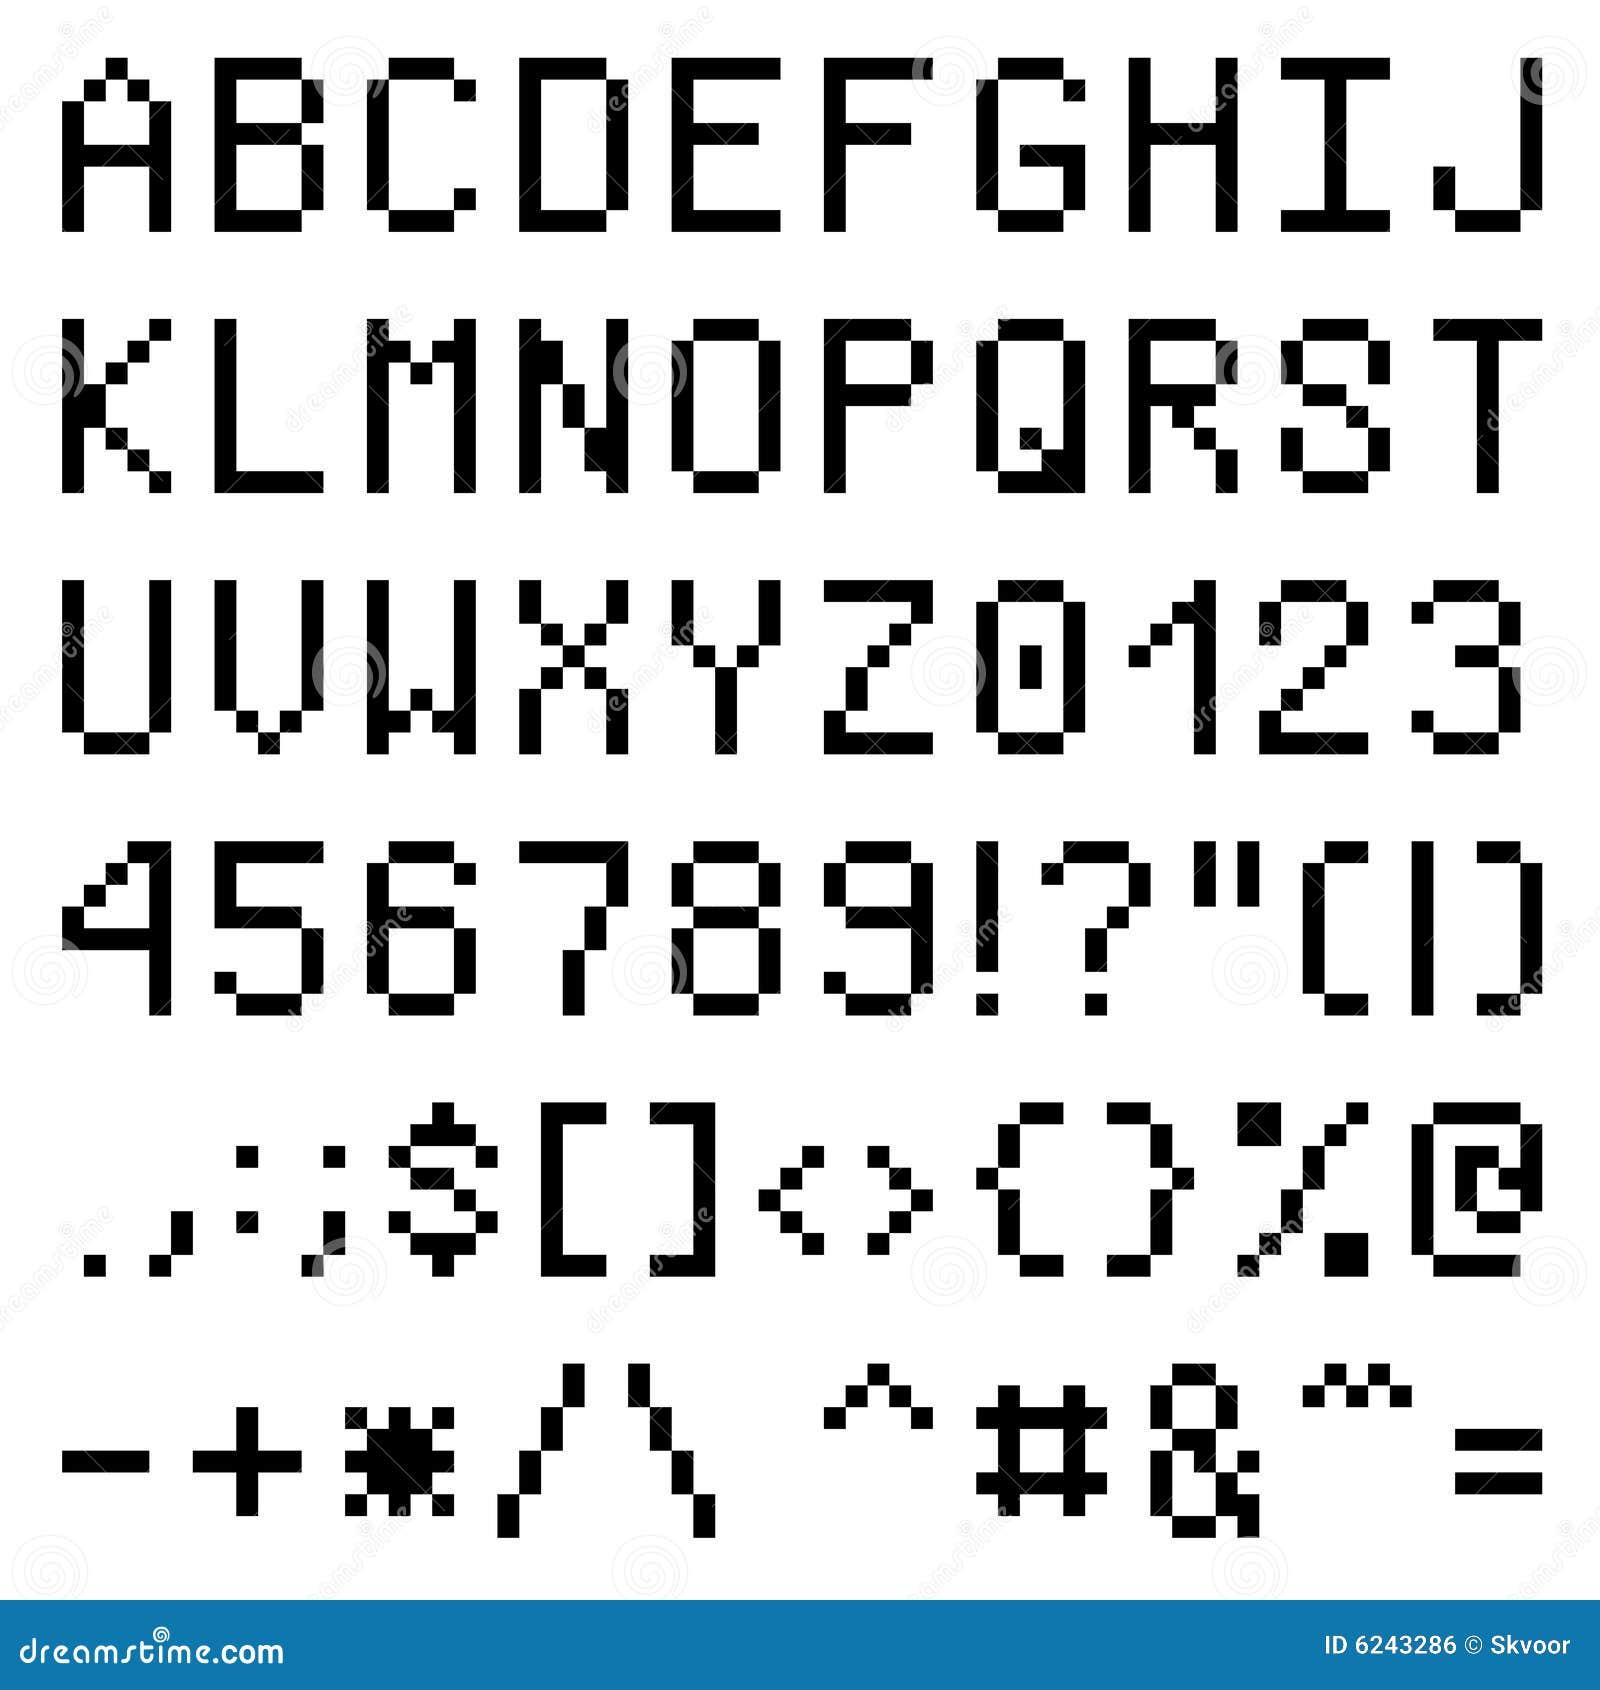 Pixel Font Royalty Free Stock Image